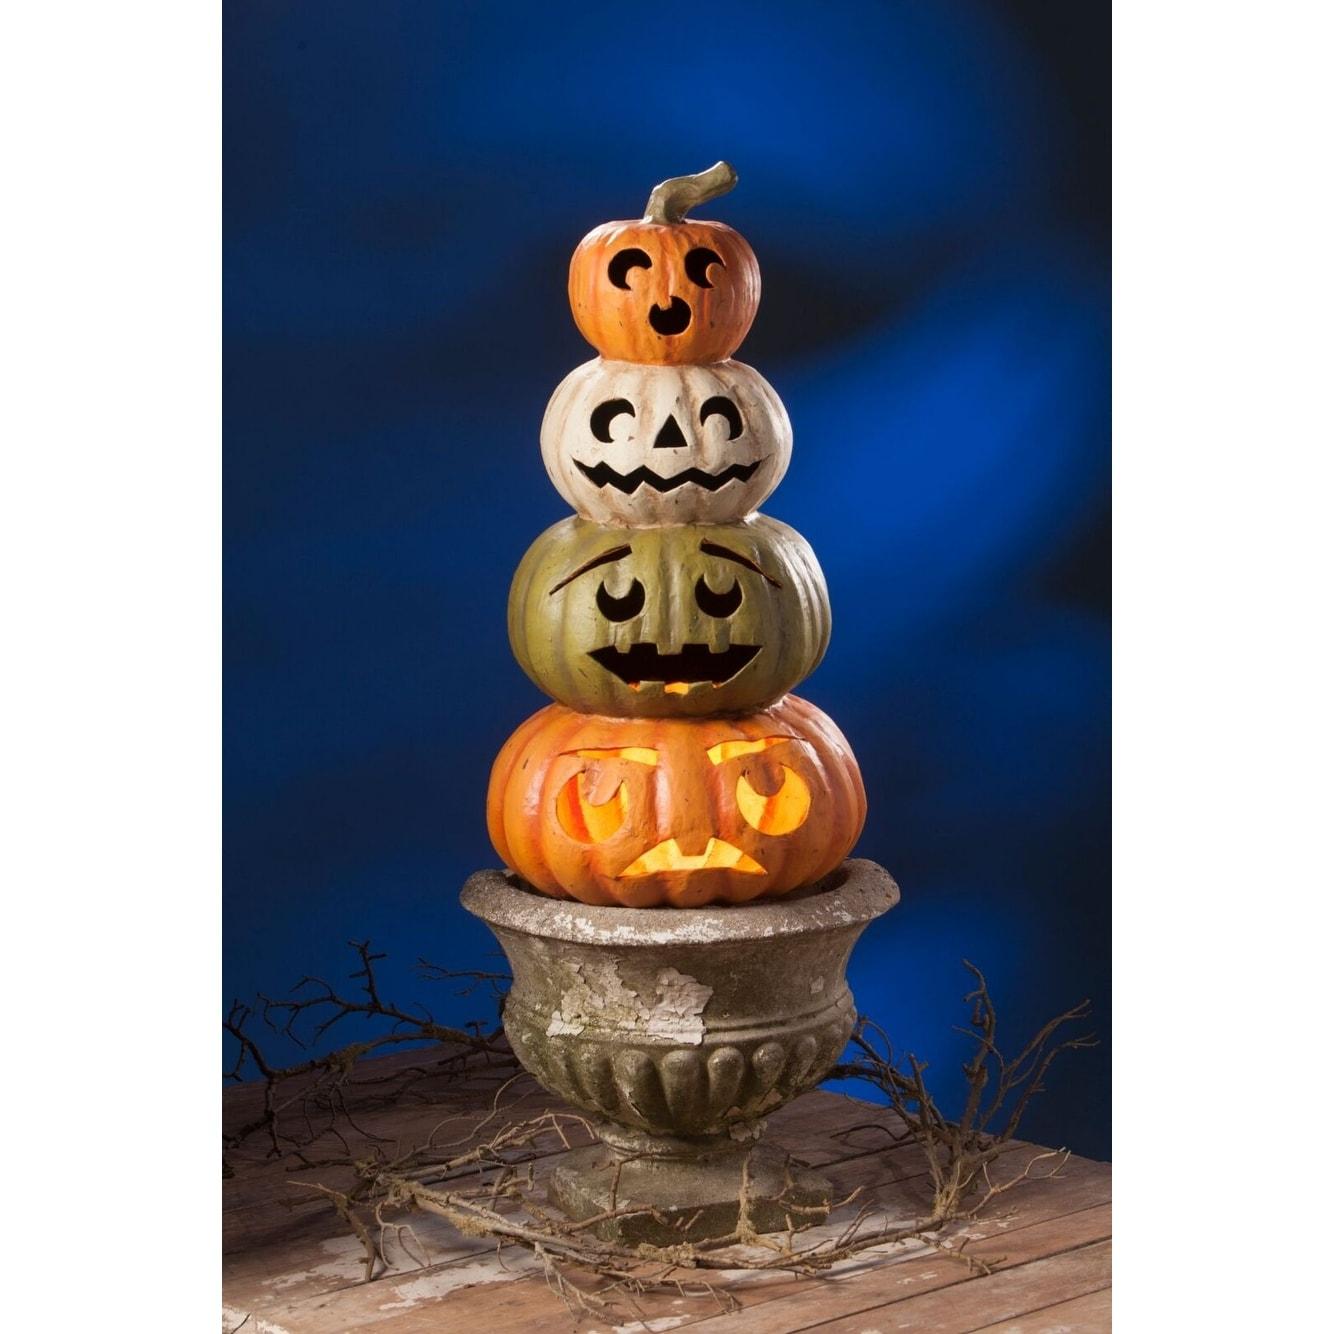 24 Orange And Olive Green Jack O Lantern Topiary Halloween Figurine Overstock 29858128